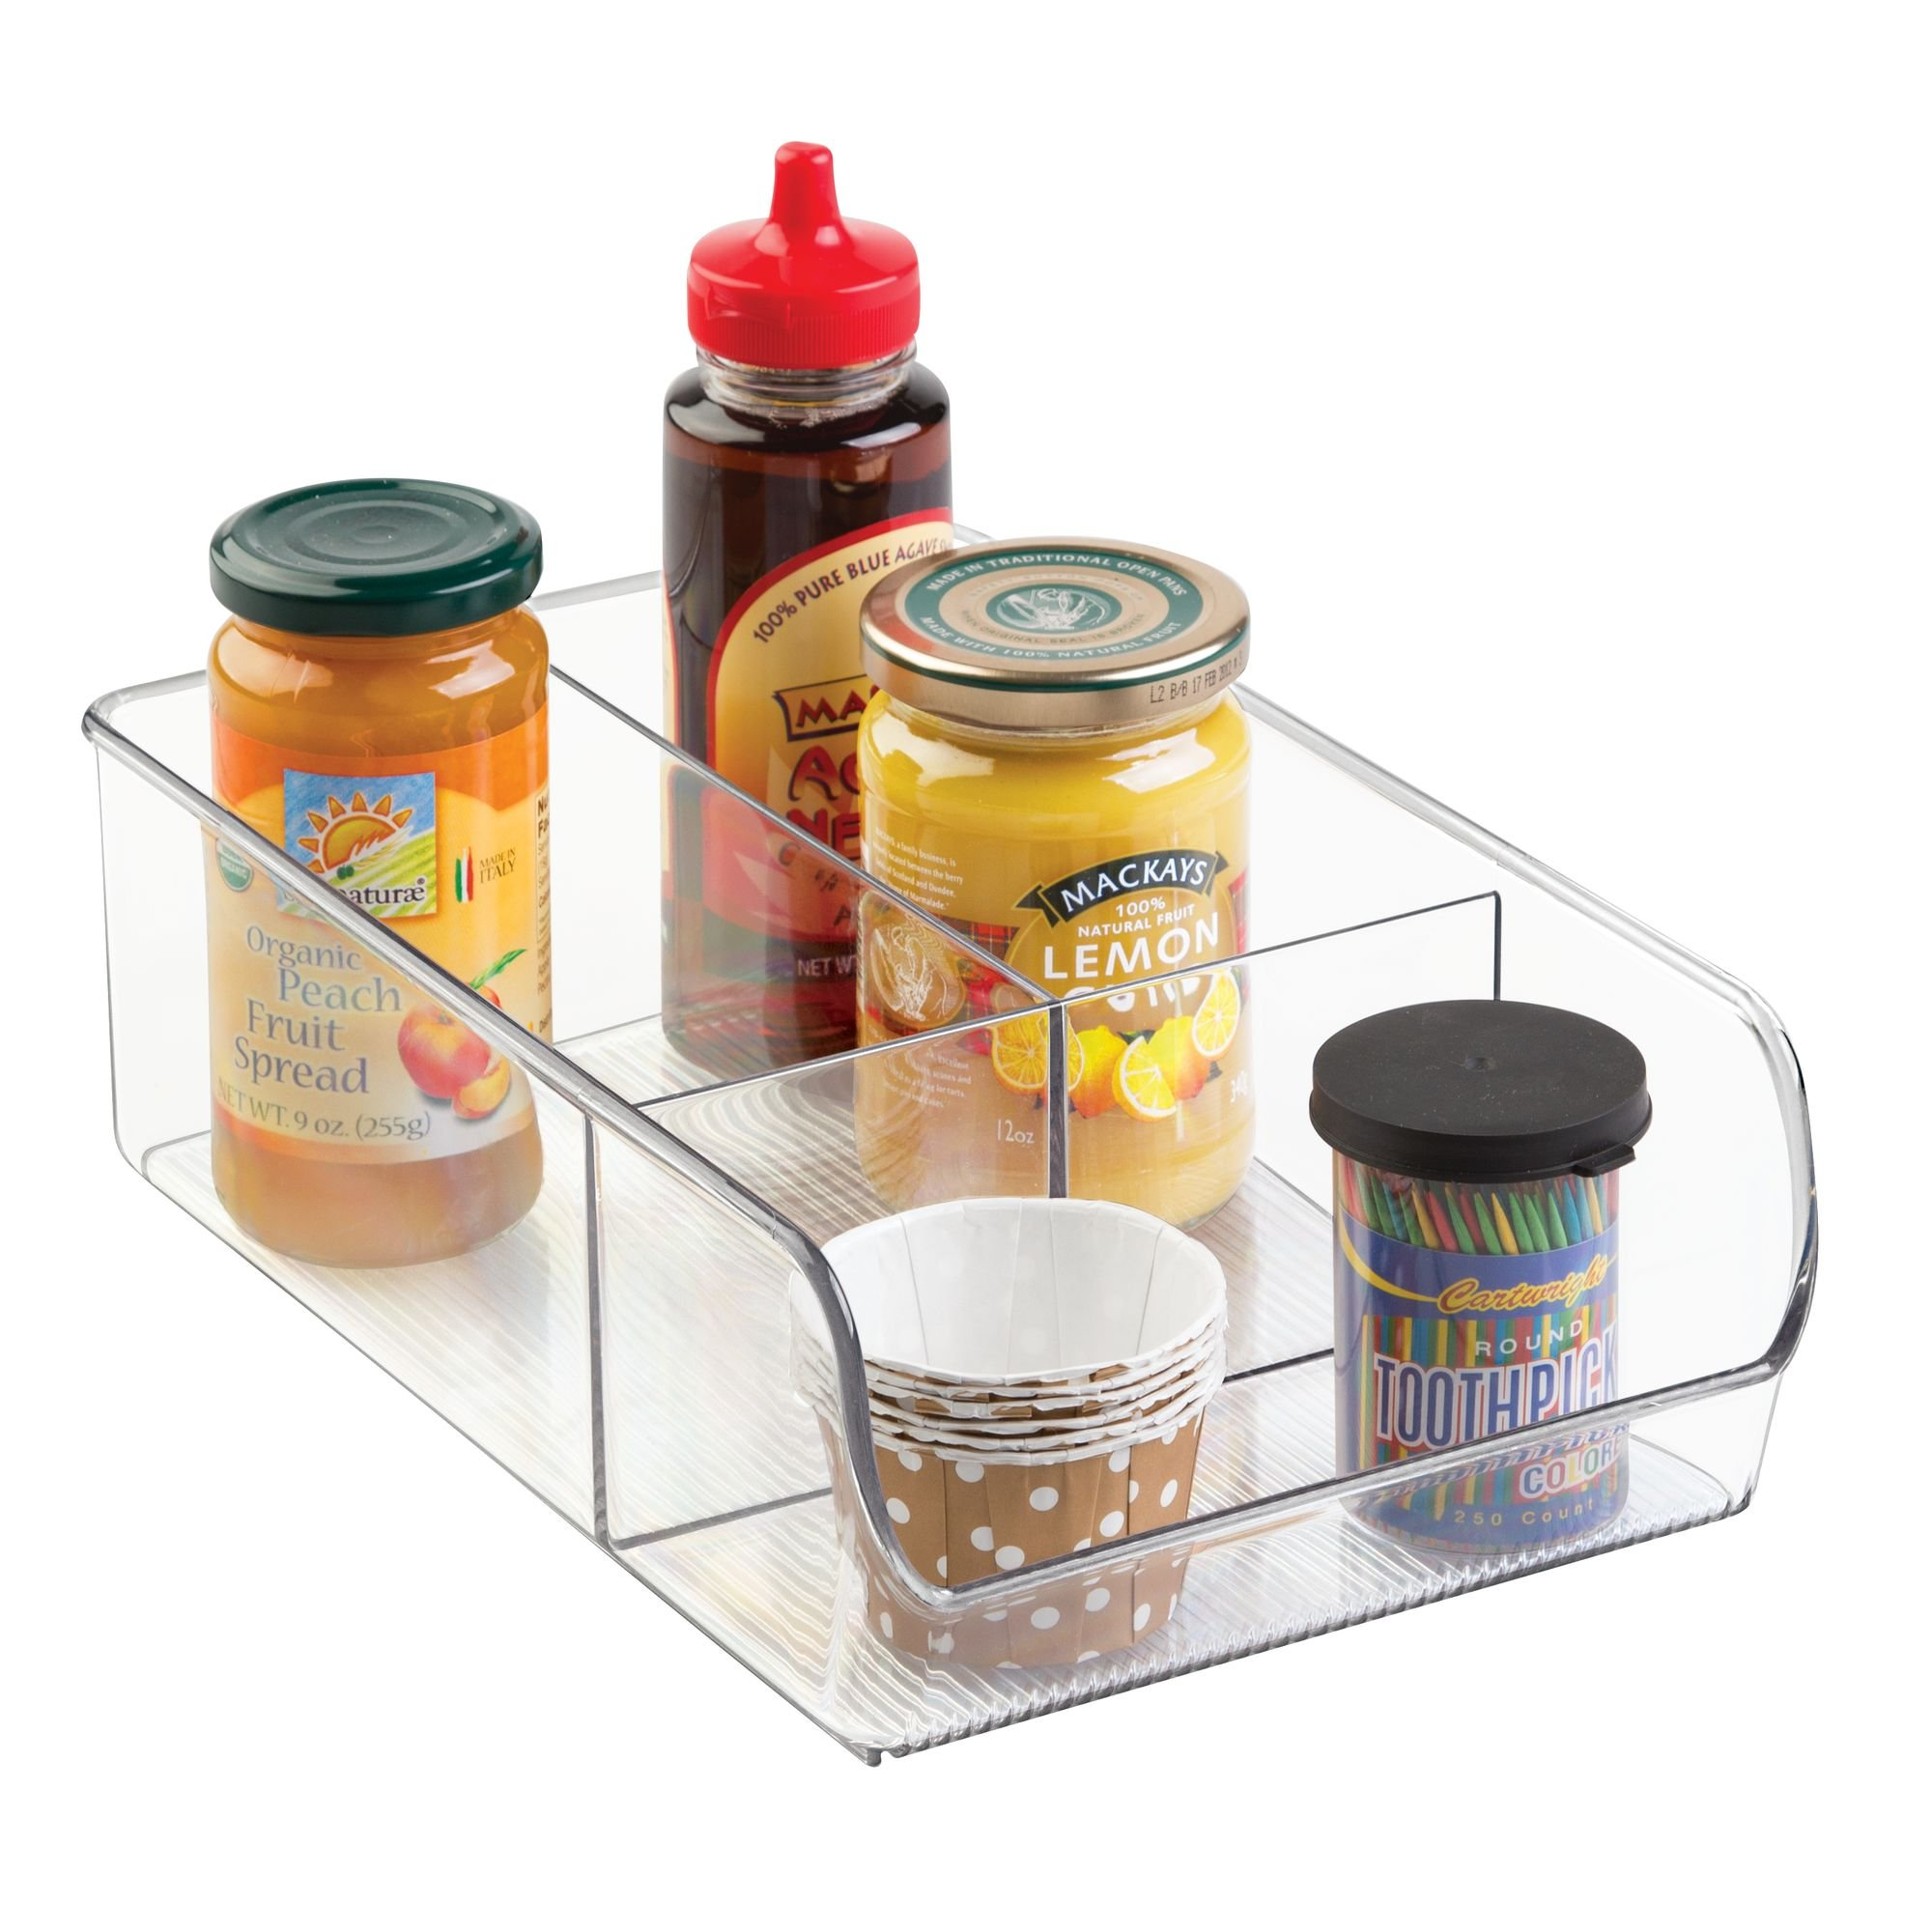 InterDesign Linus Organizador para la cocina, caja organizadora de plástico antirrotura extragrande con 3 compartimentos